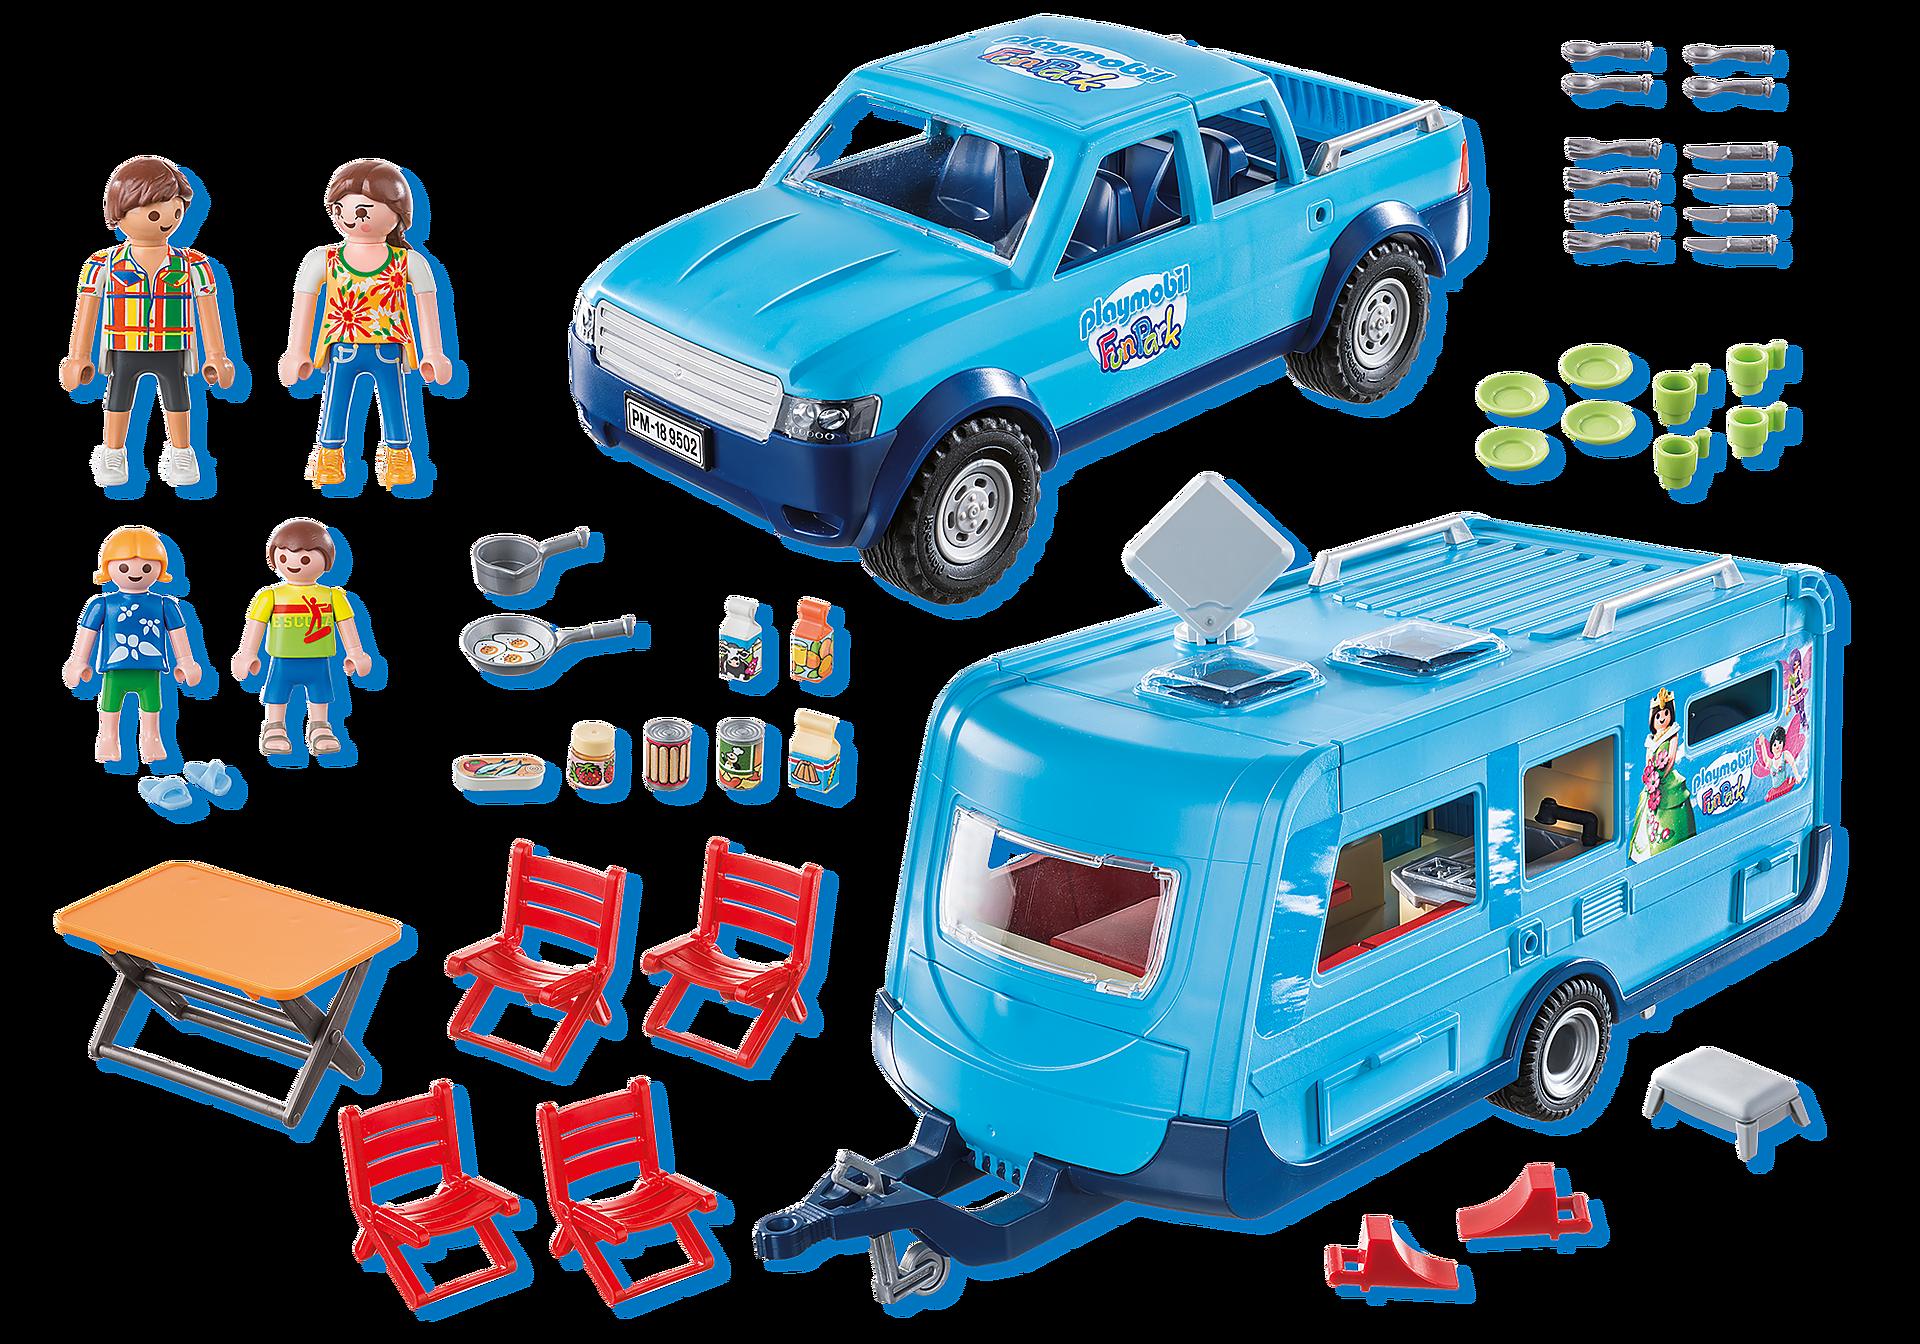 9502 Playmobil-Pick-Up mit Wohnwagen zoom image3